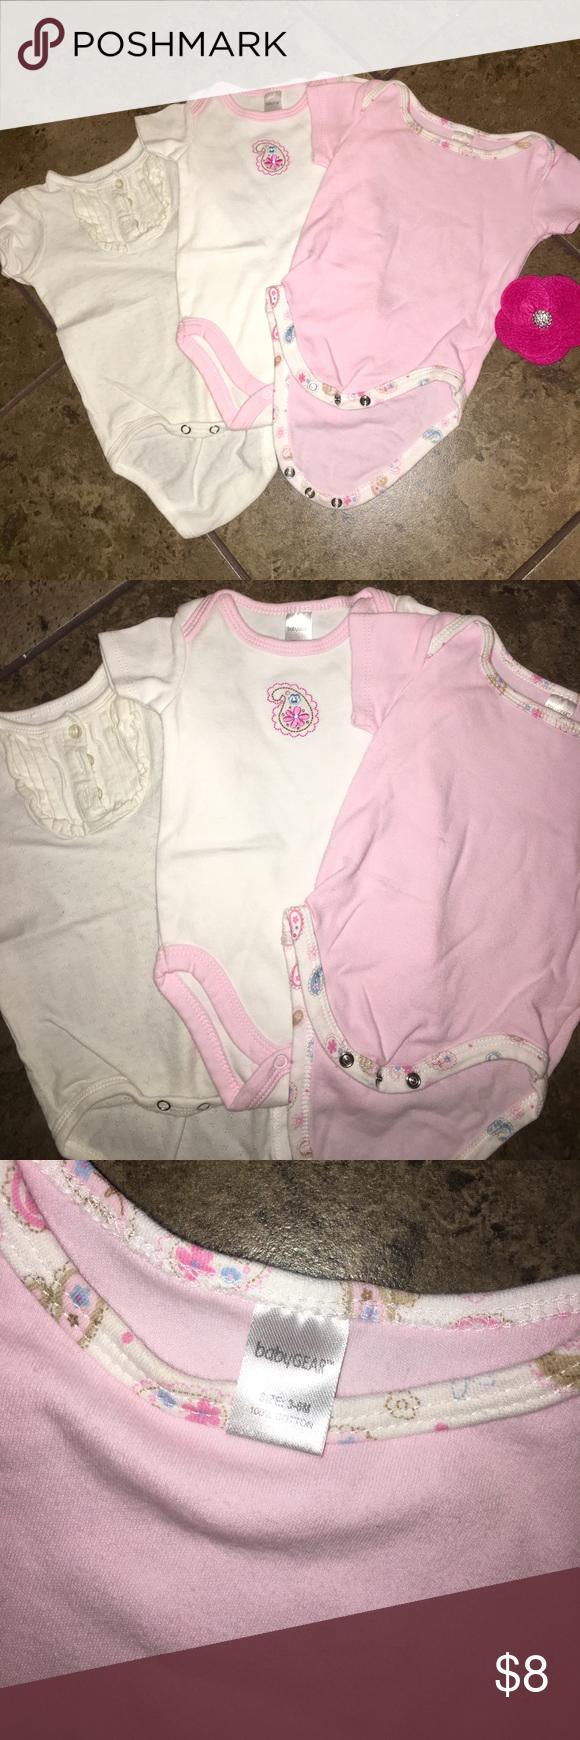 Onesie set Baby girl onesies Excellent condition Sold ...